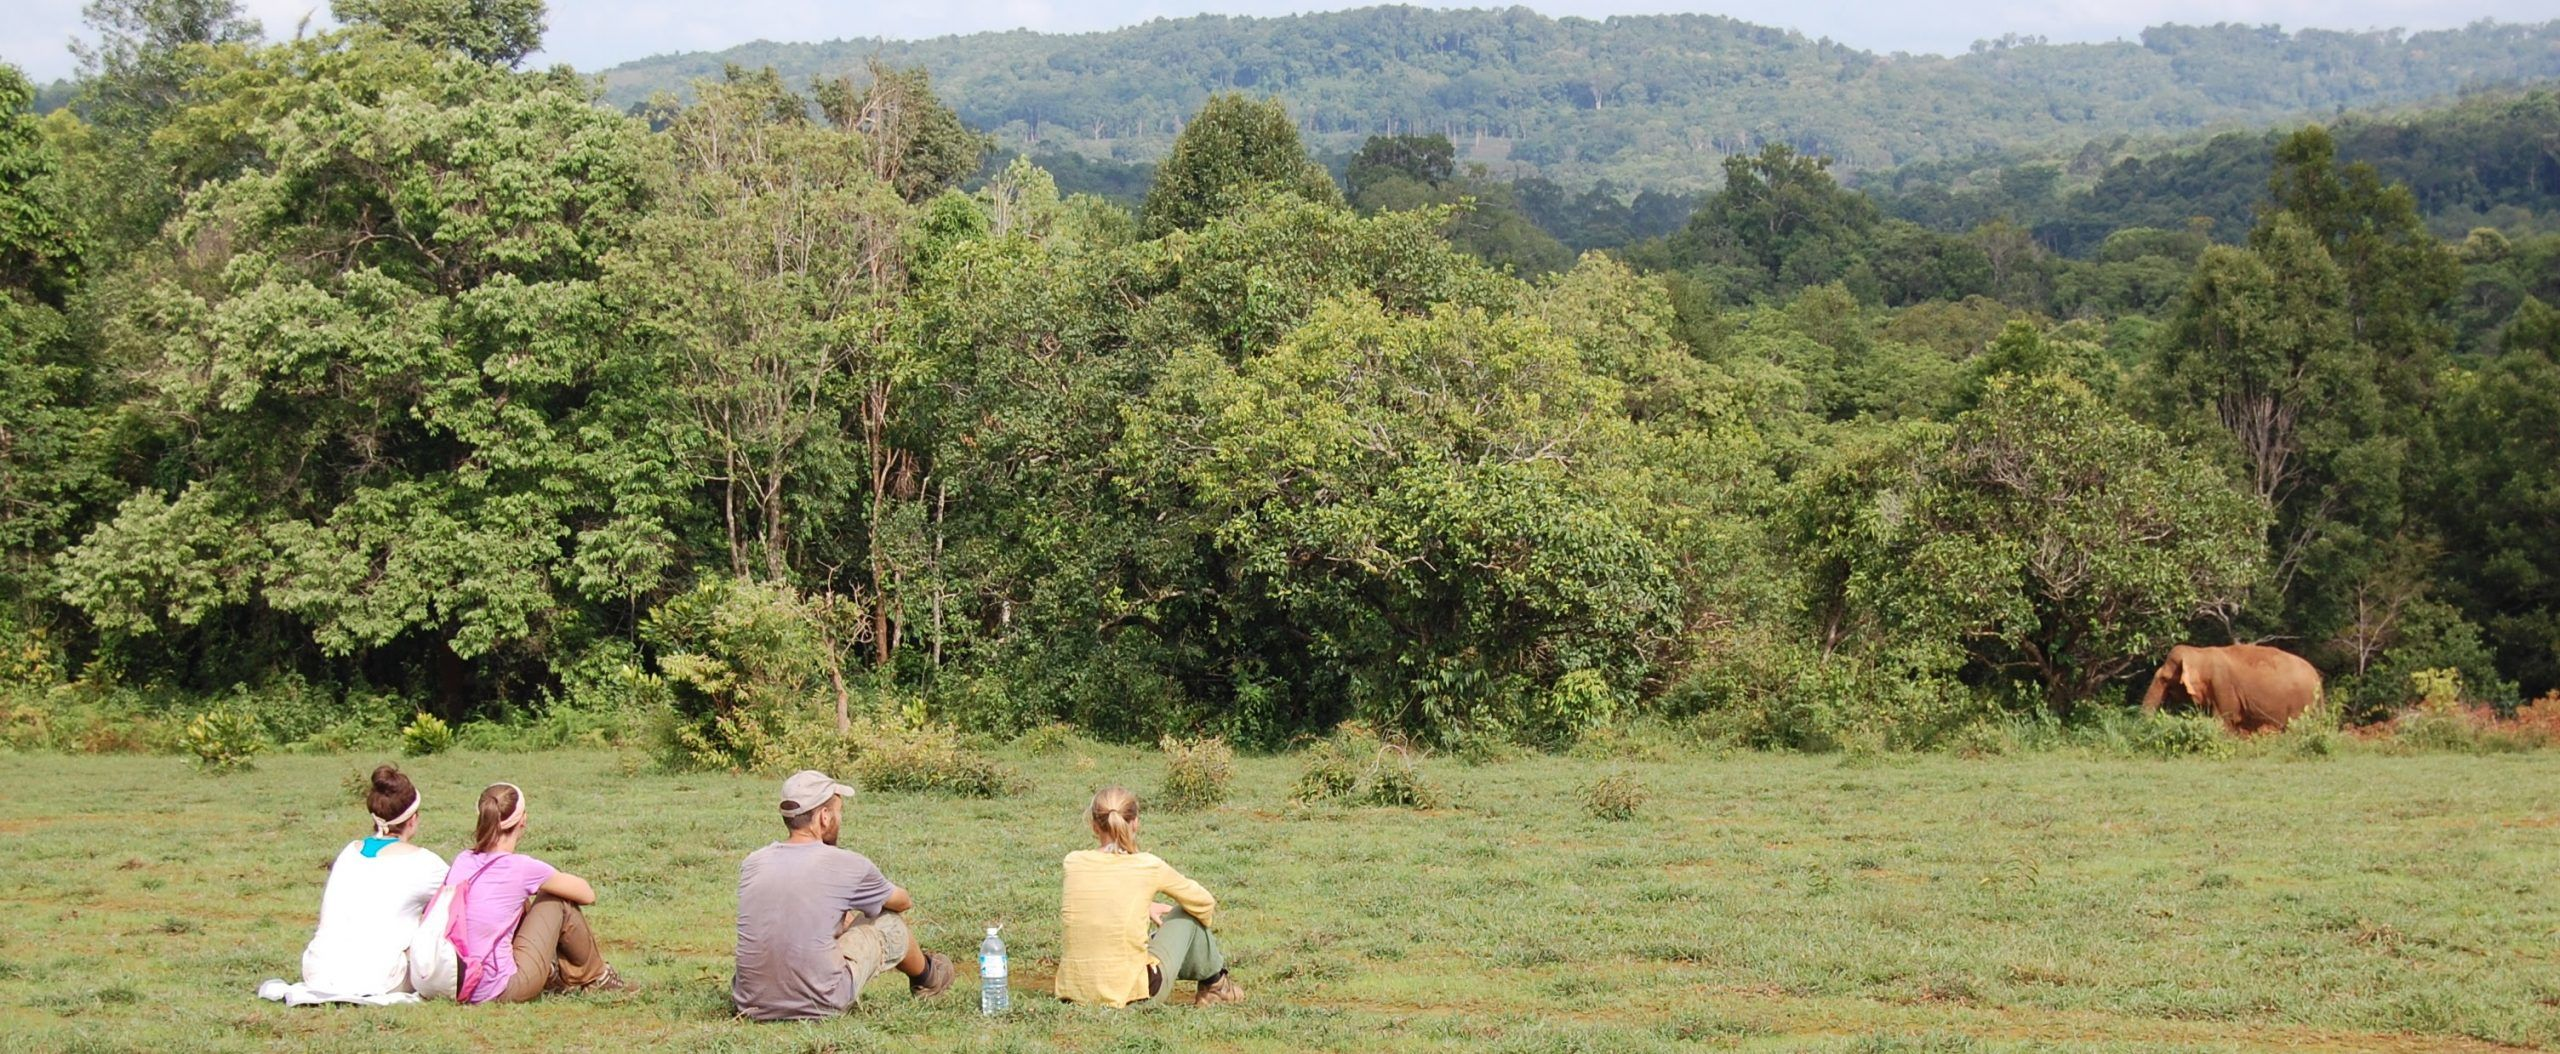 Volunteers observing elephants